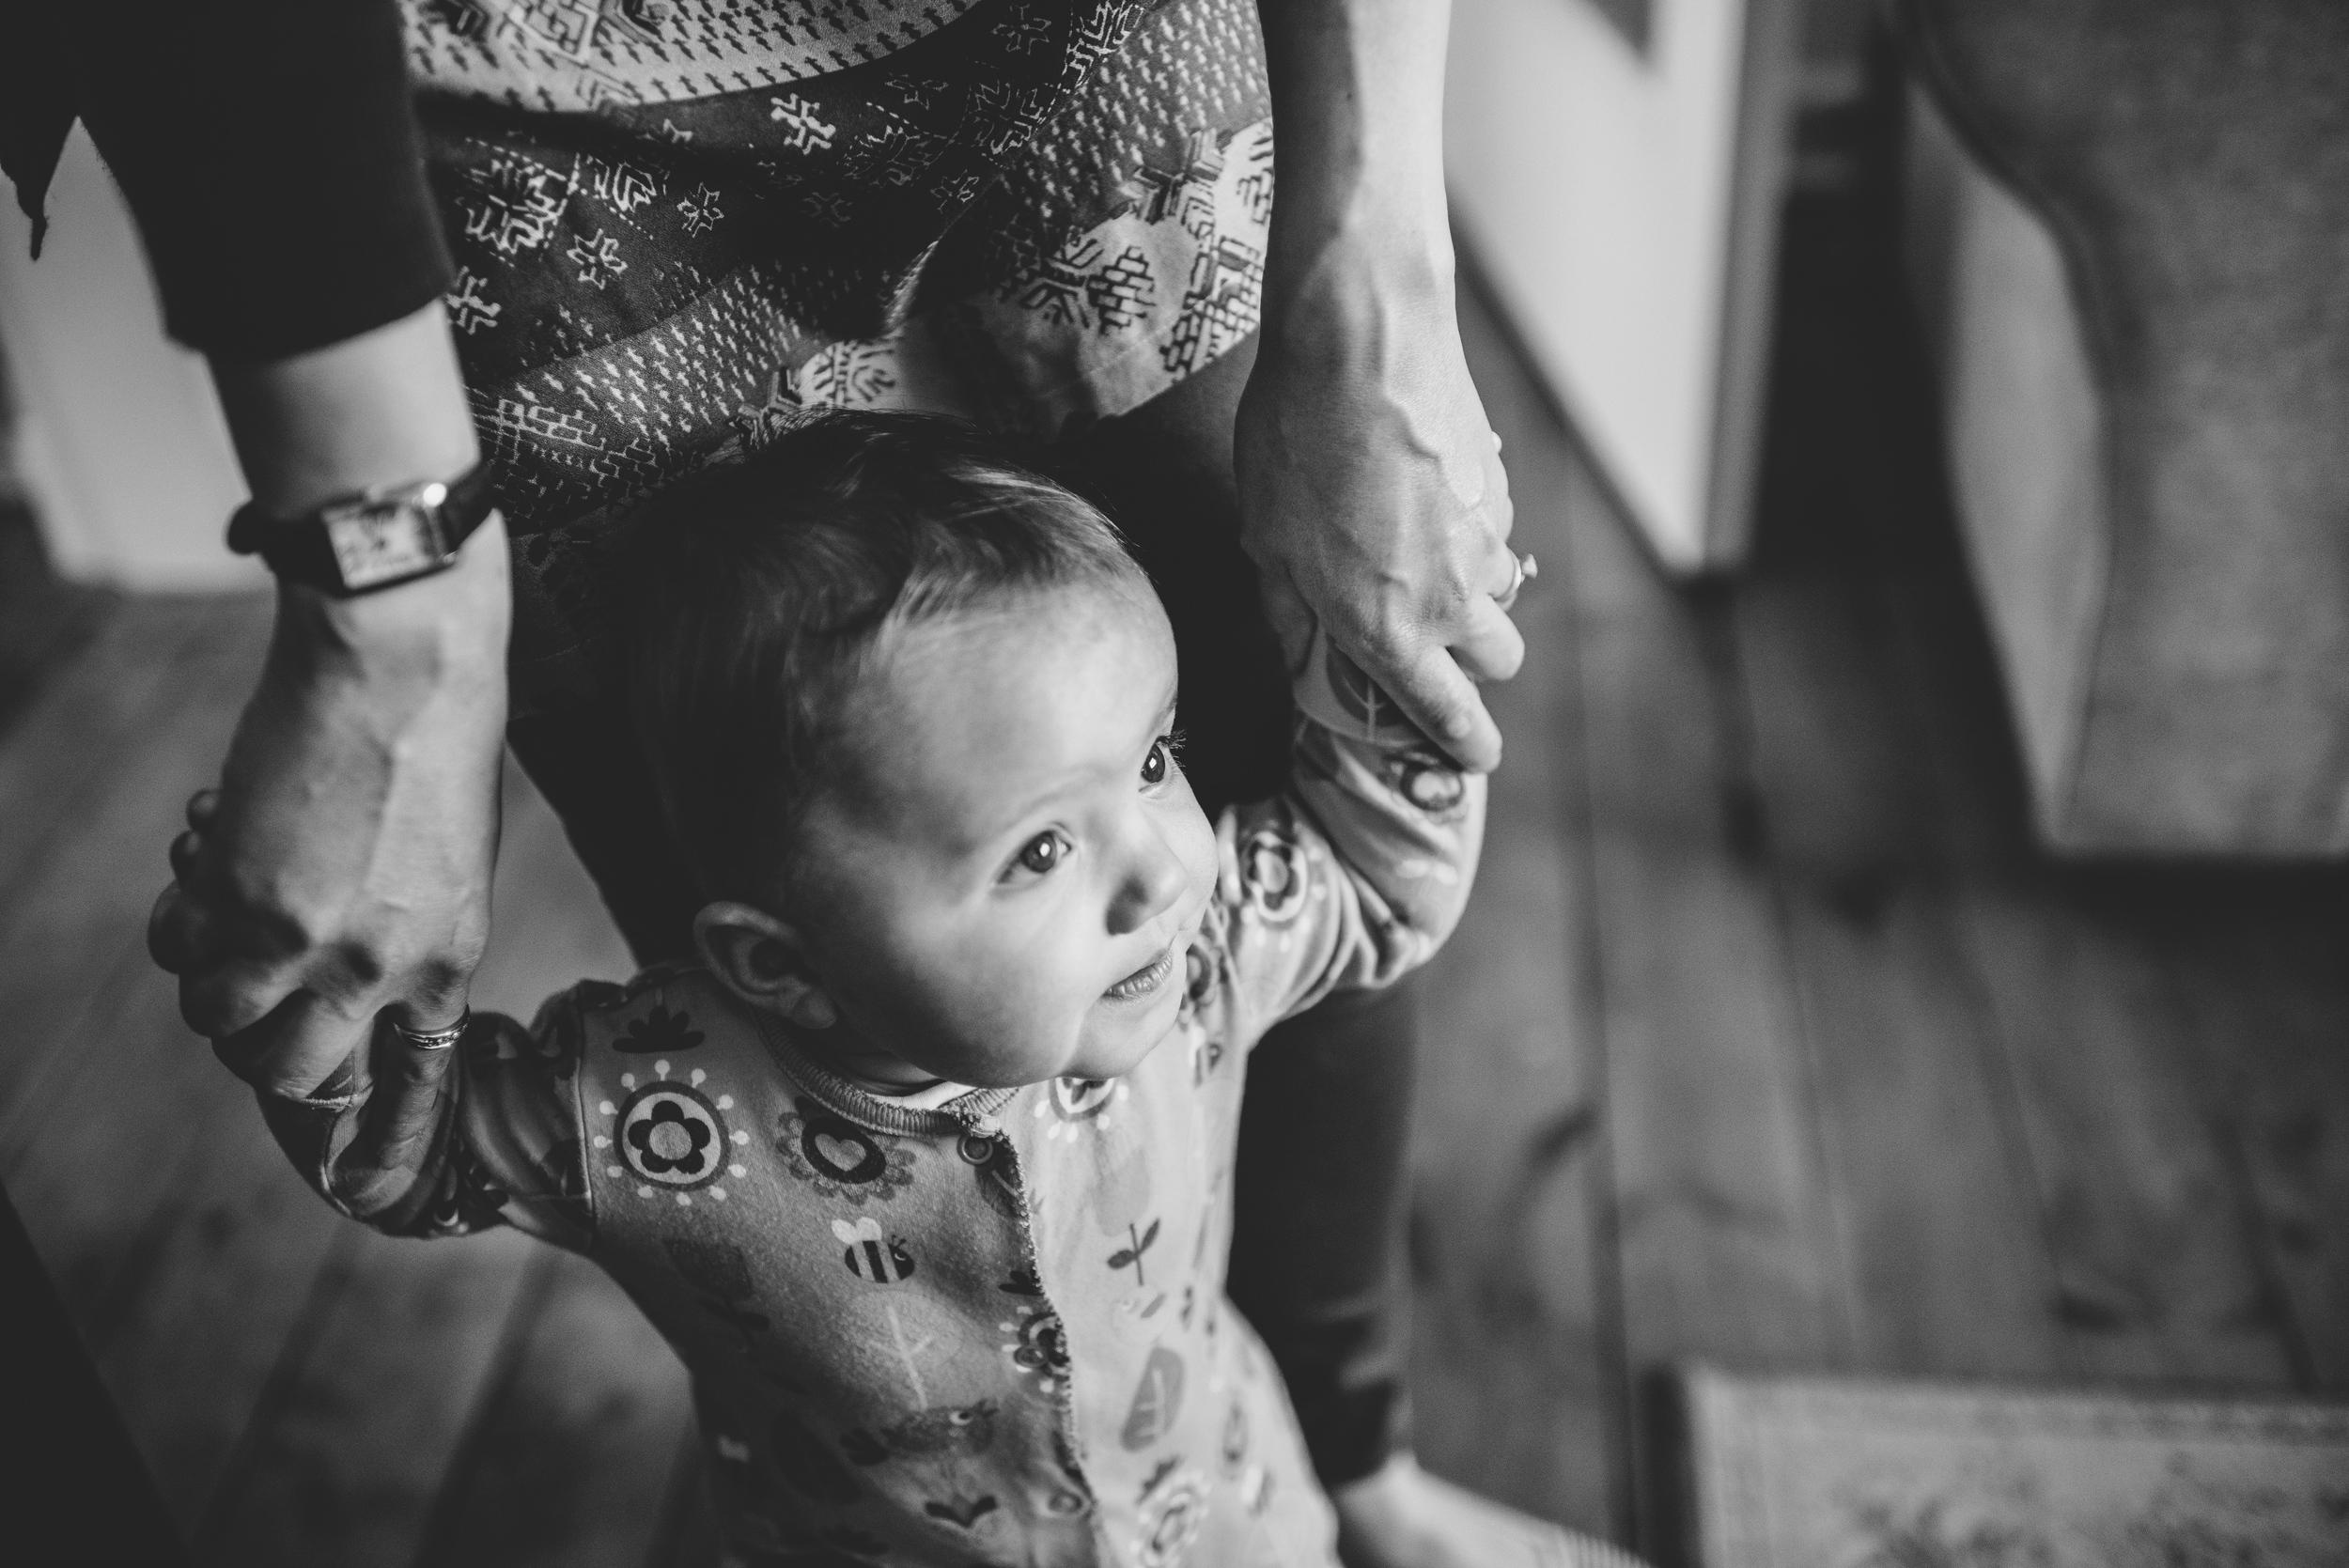 0008-ALTERNATIVE-WEDDING-PHOTOGRAPHER-GLASGOW-FAMILY-PHOTOGRAPHER-KIDS-PORTRAITS-BABY-PORTRAITS-GLASGOW.JPG